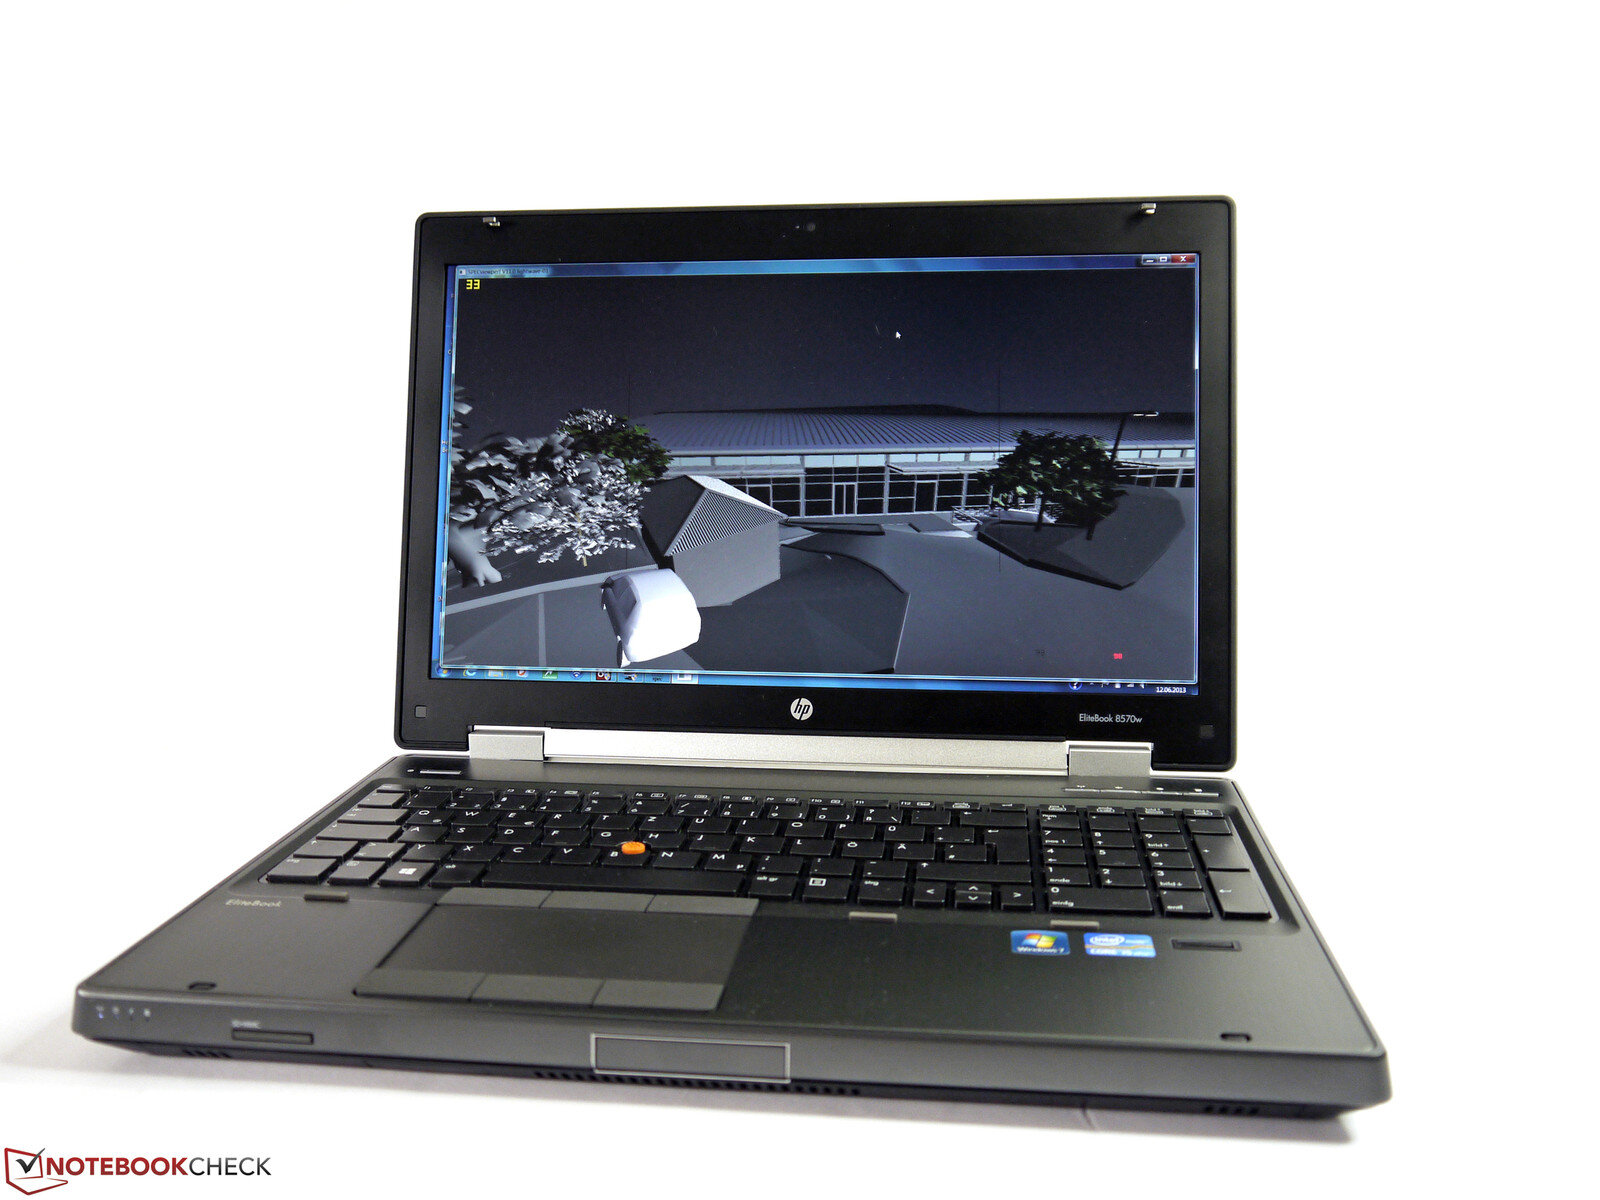 Laptop HP Elitebook 8570W - Intel Core i7-3630QM 2.4GHz, 8GB RAM, 500GB HDD, NVIDIA Quadro K1000M, 15.6 inch